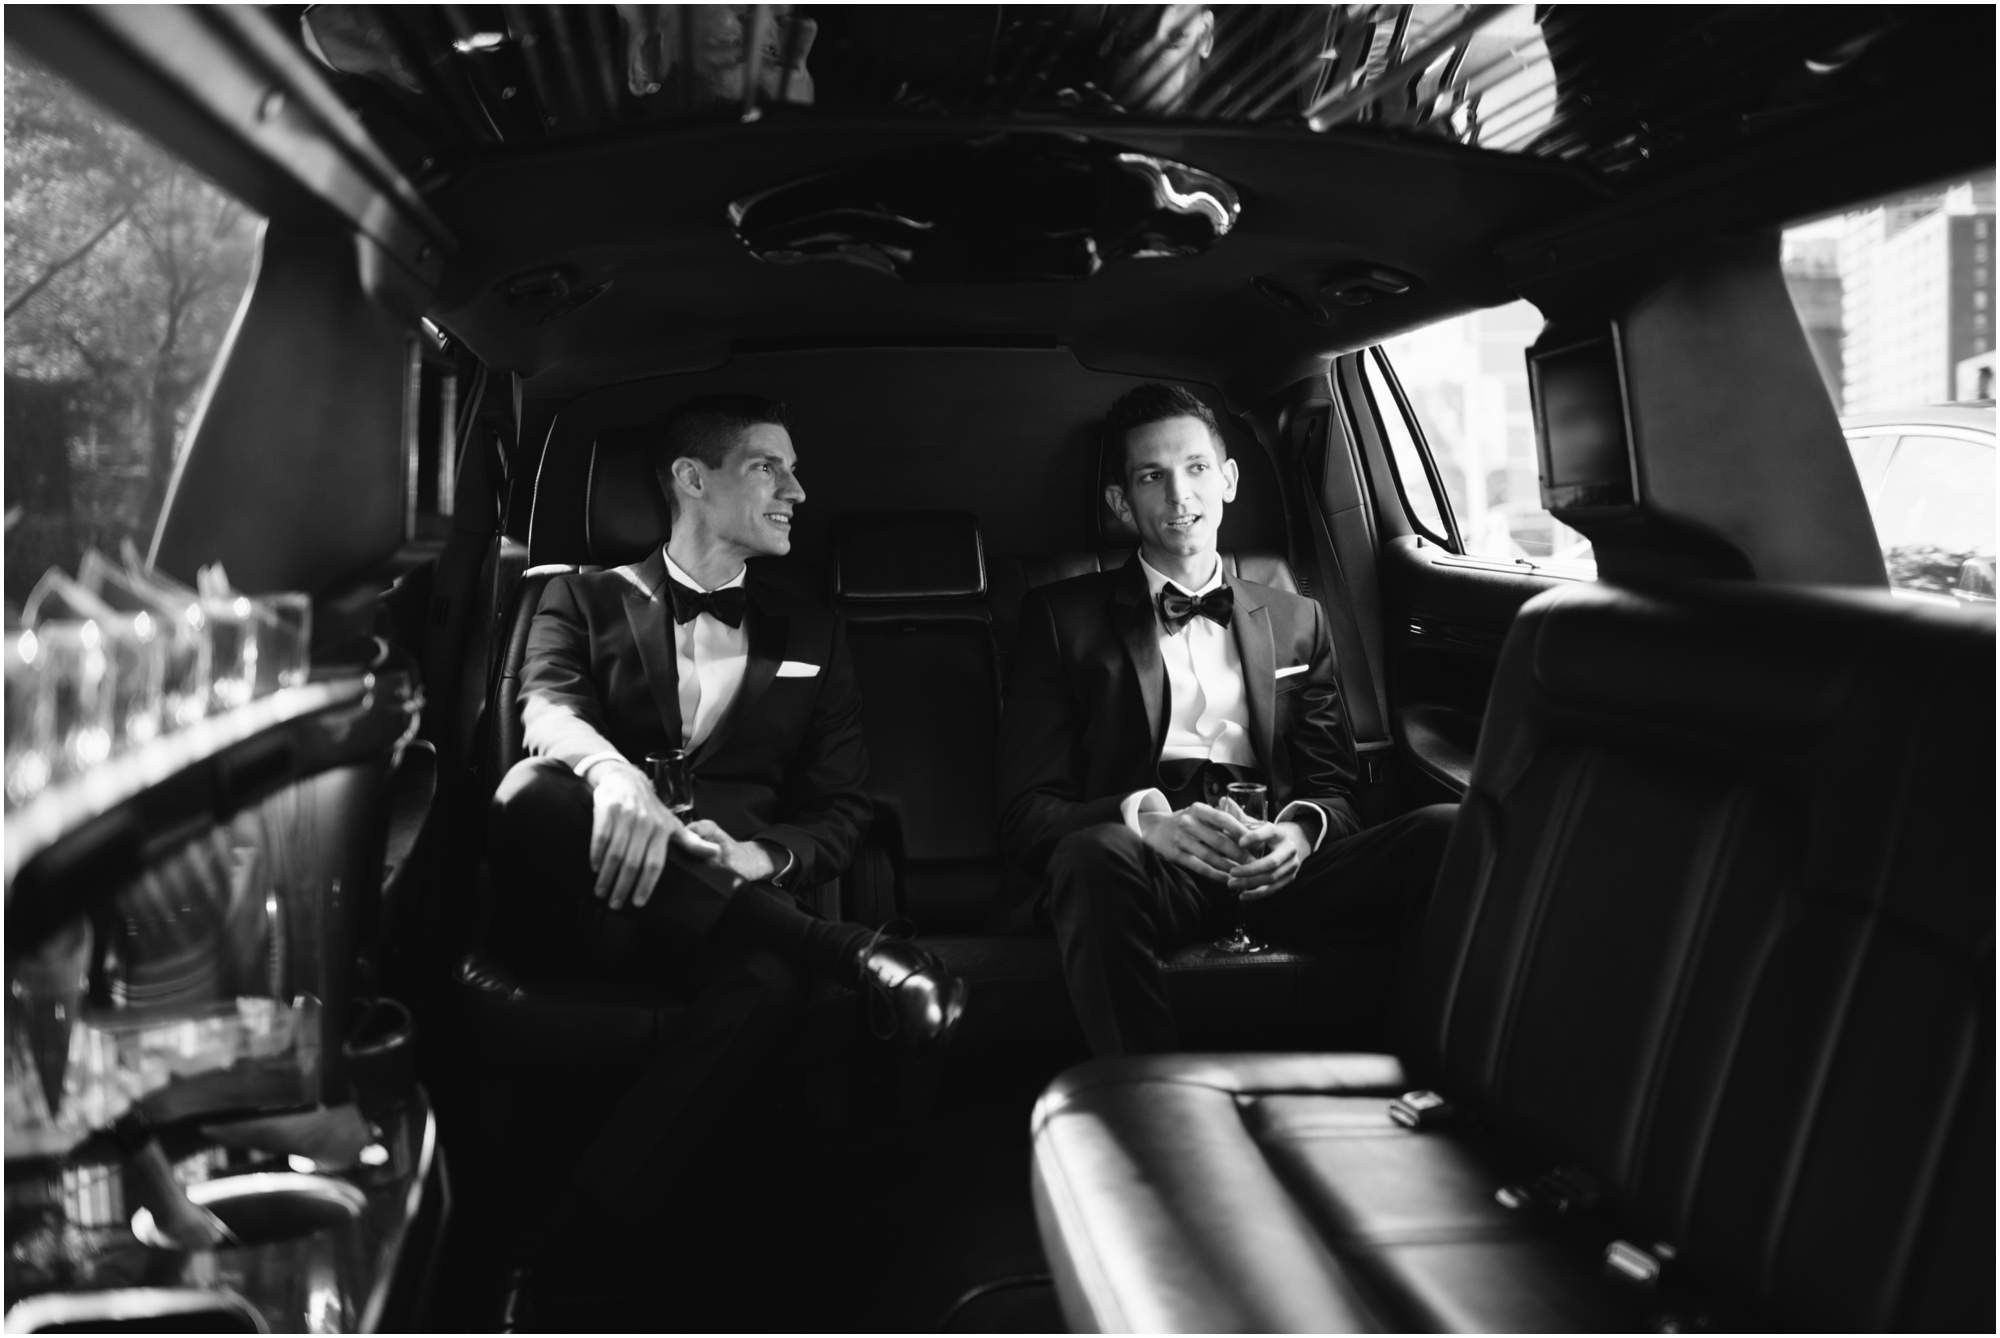 gay-wedding-photographer-williamsburgphotostudios-thefoundry-wedding-photographer_0030.jpg